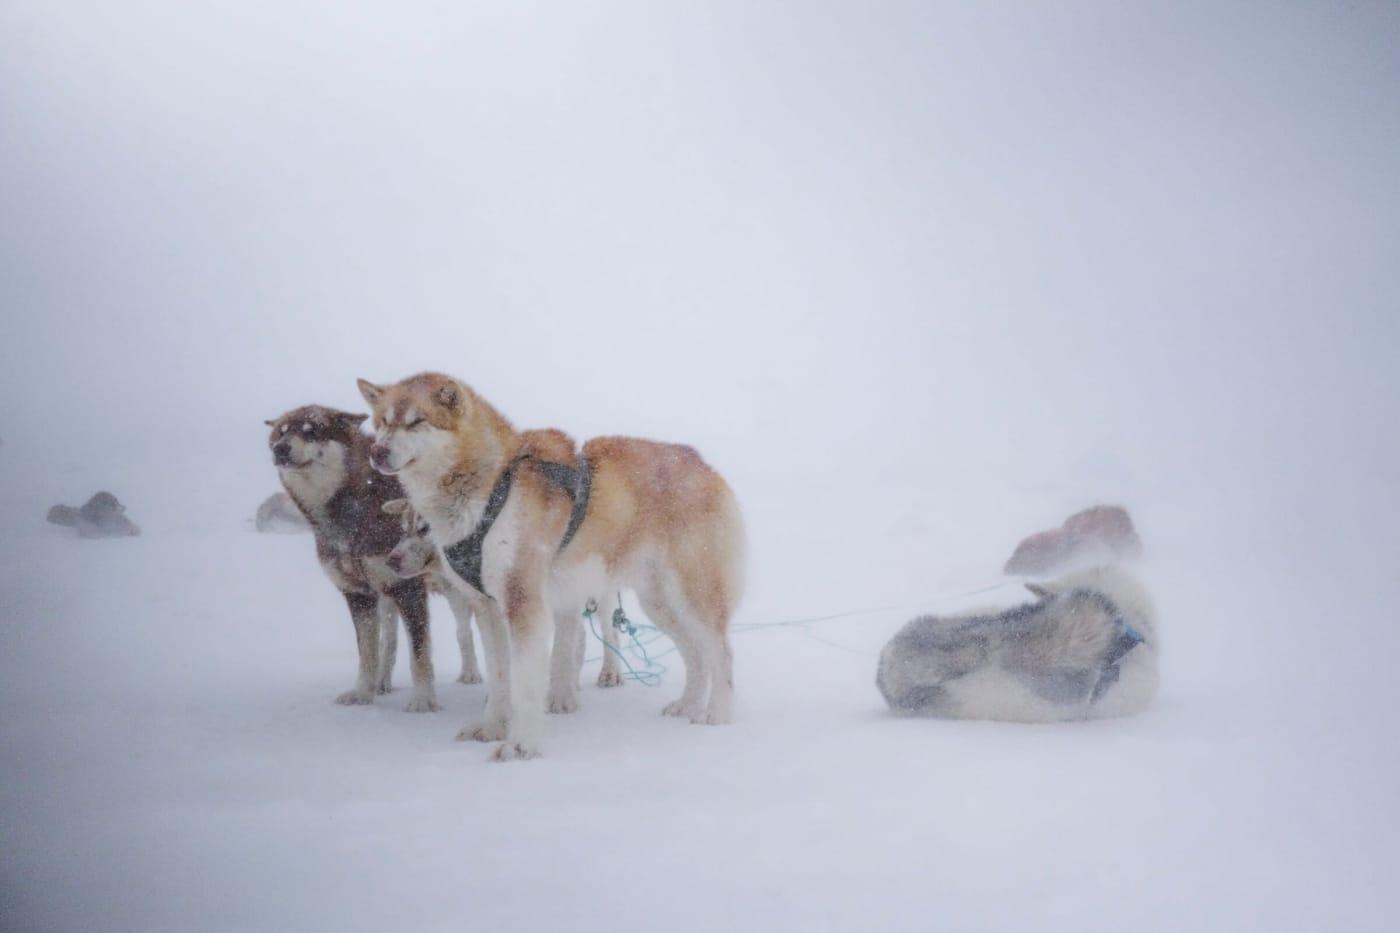 Dogs in Blizzard. Photo by Kim Insuk